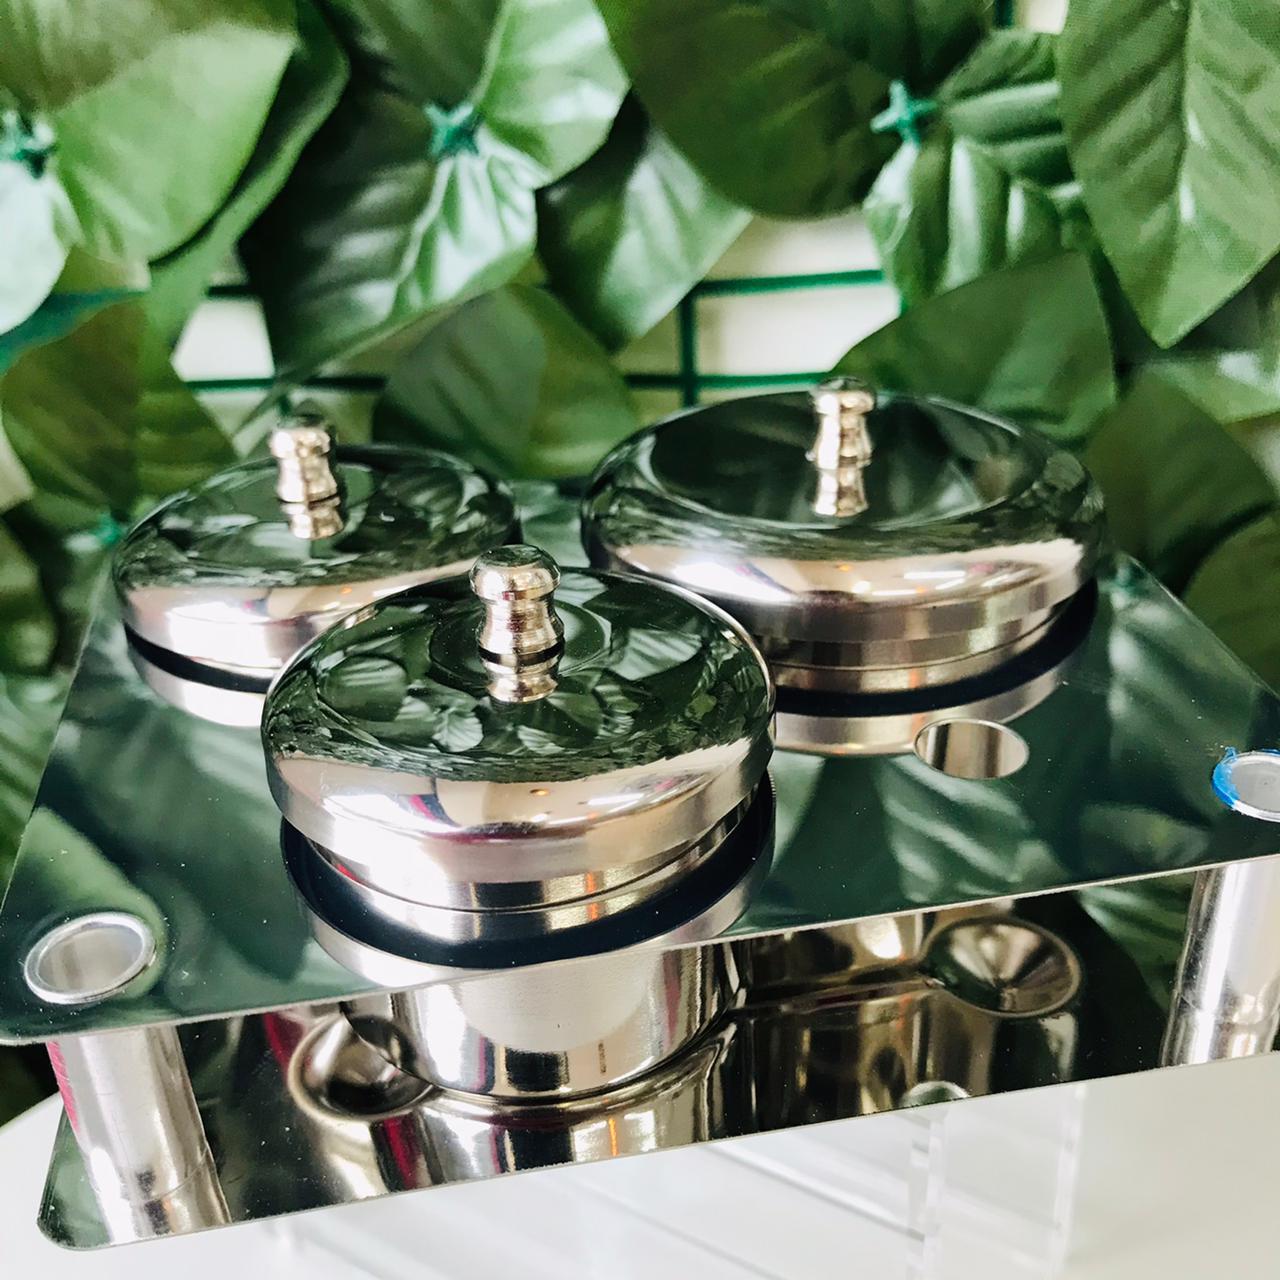 Kit dappen porta monomer luxo 3 peças   - Sílvia Pedrarias & Cia